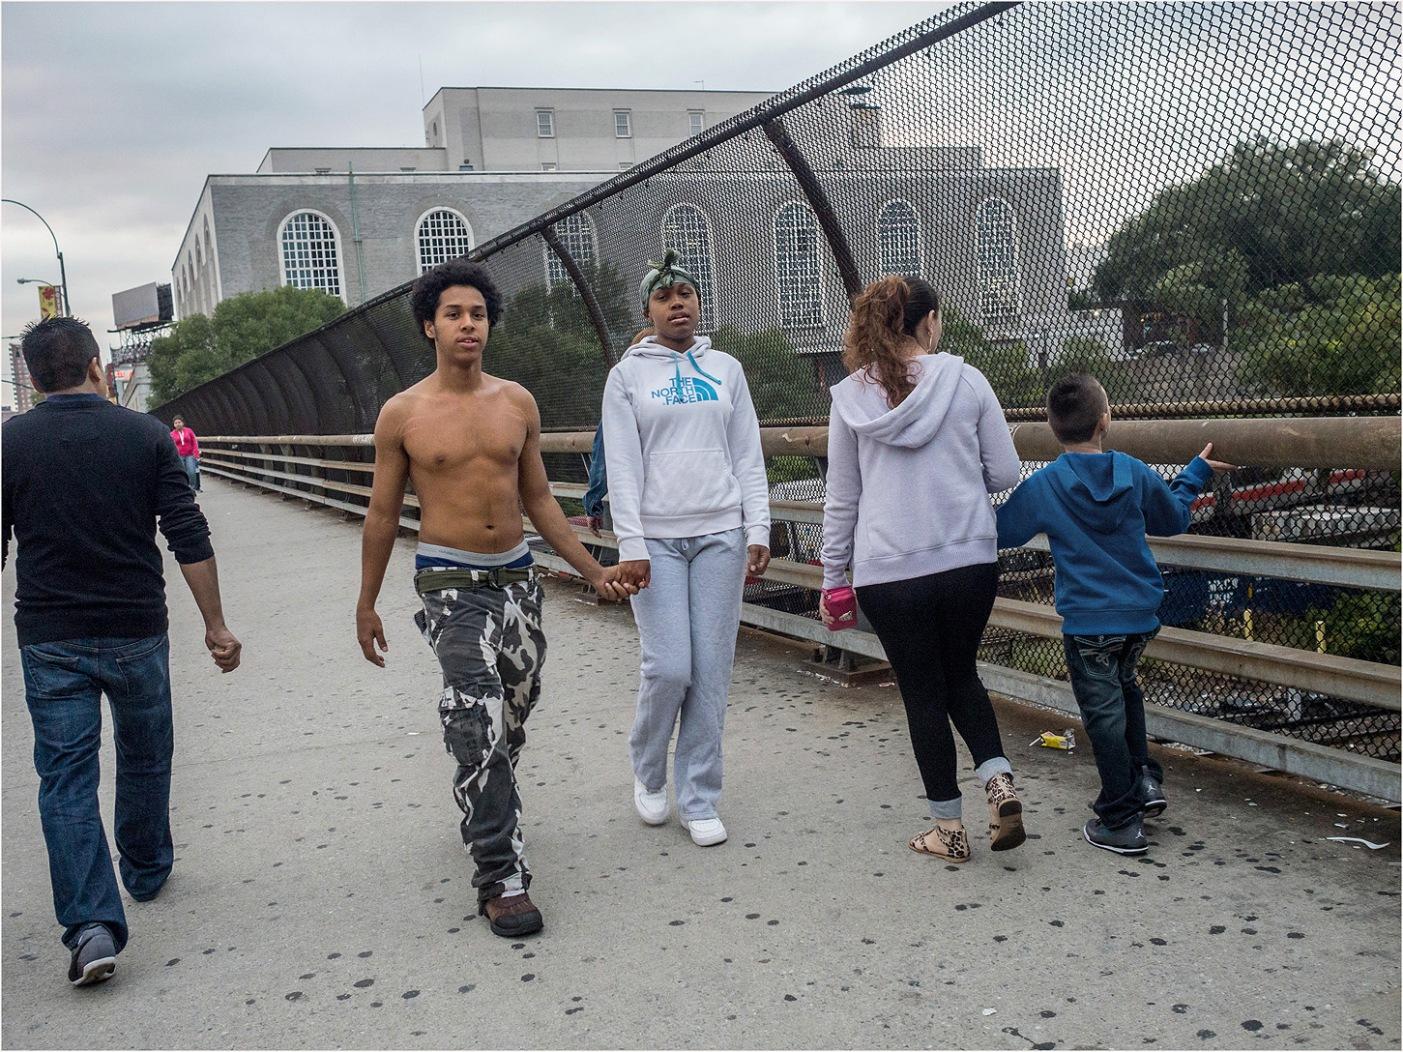 *Bronx-Teens-OneLegged-Stare-2014 copy